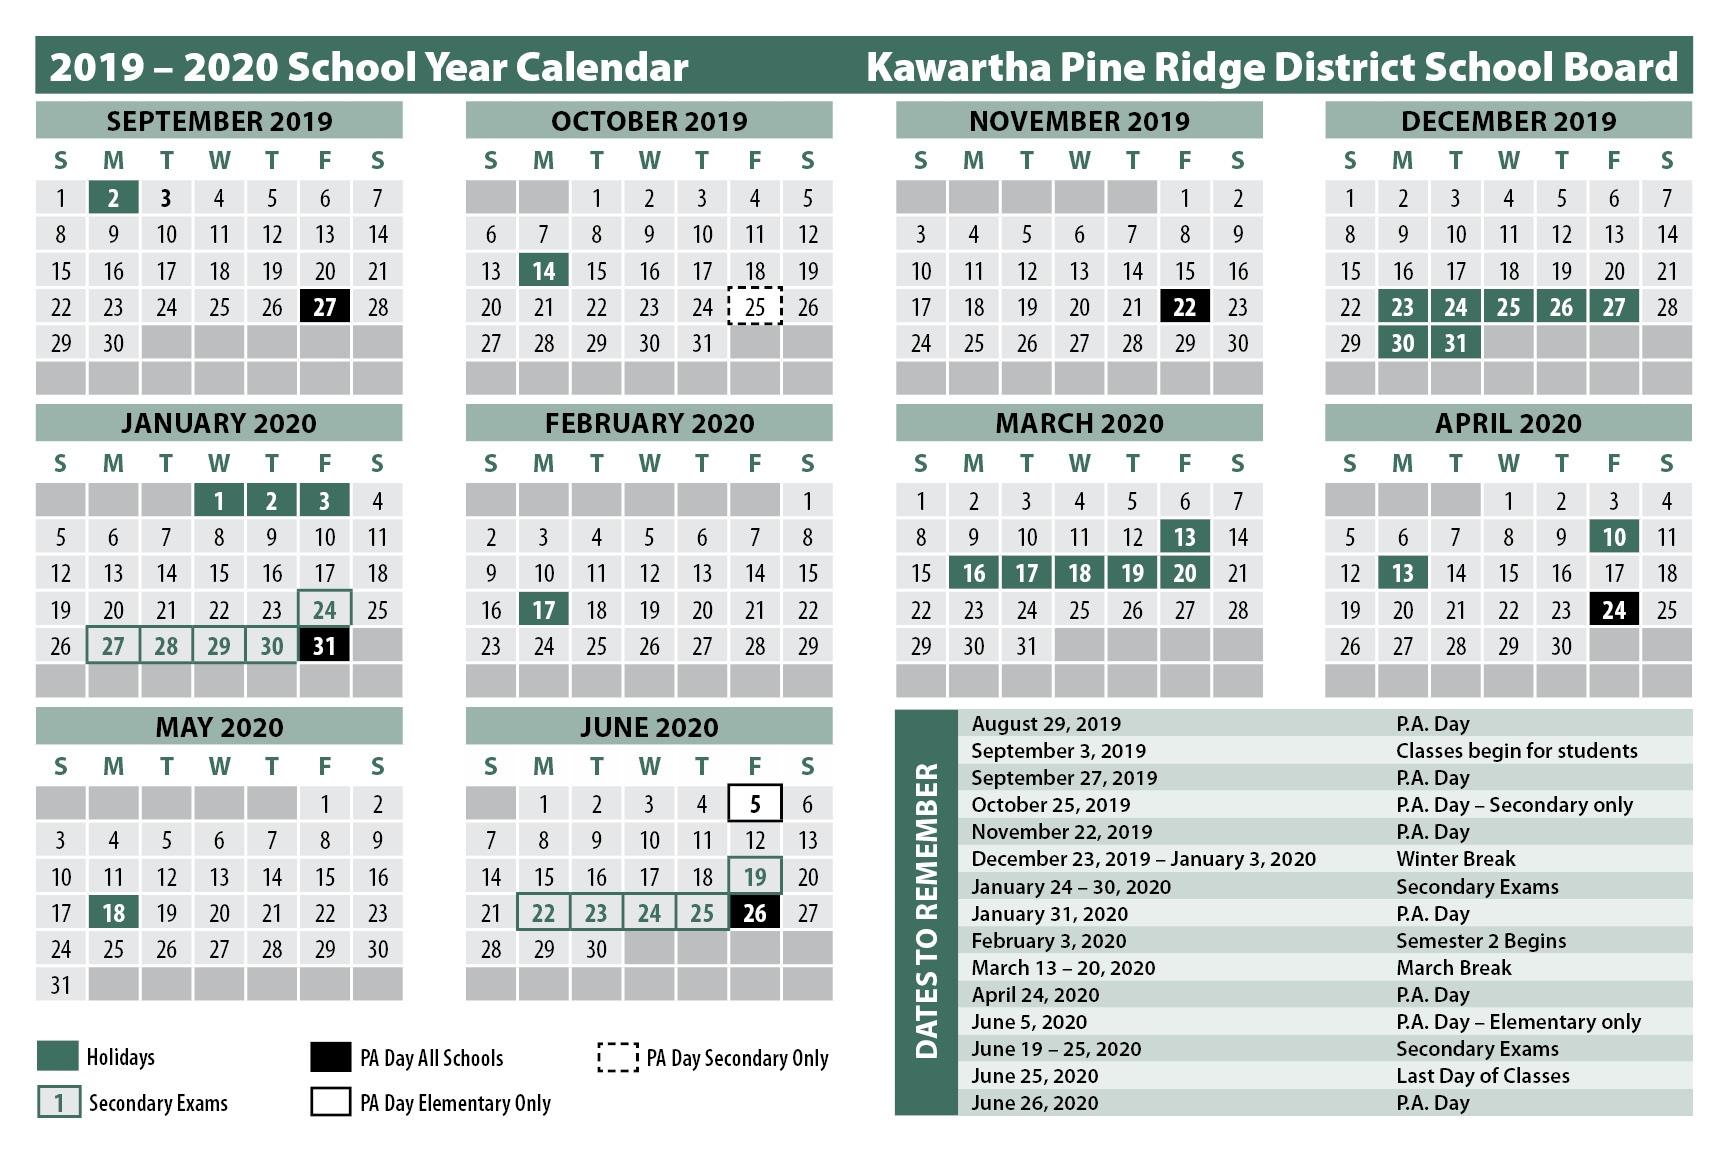 School Calendars in Special Days Calendat 2019 For Schools